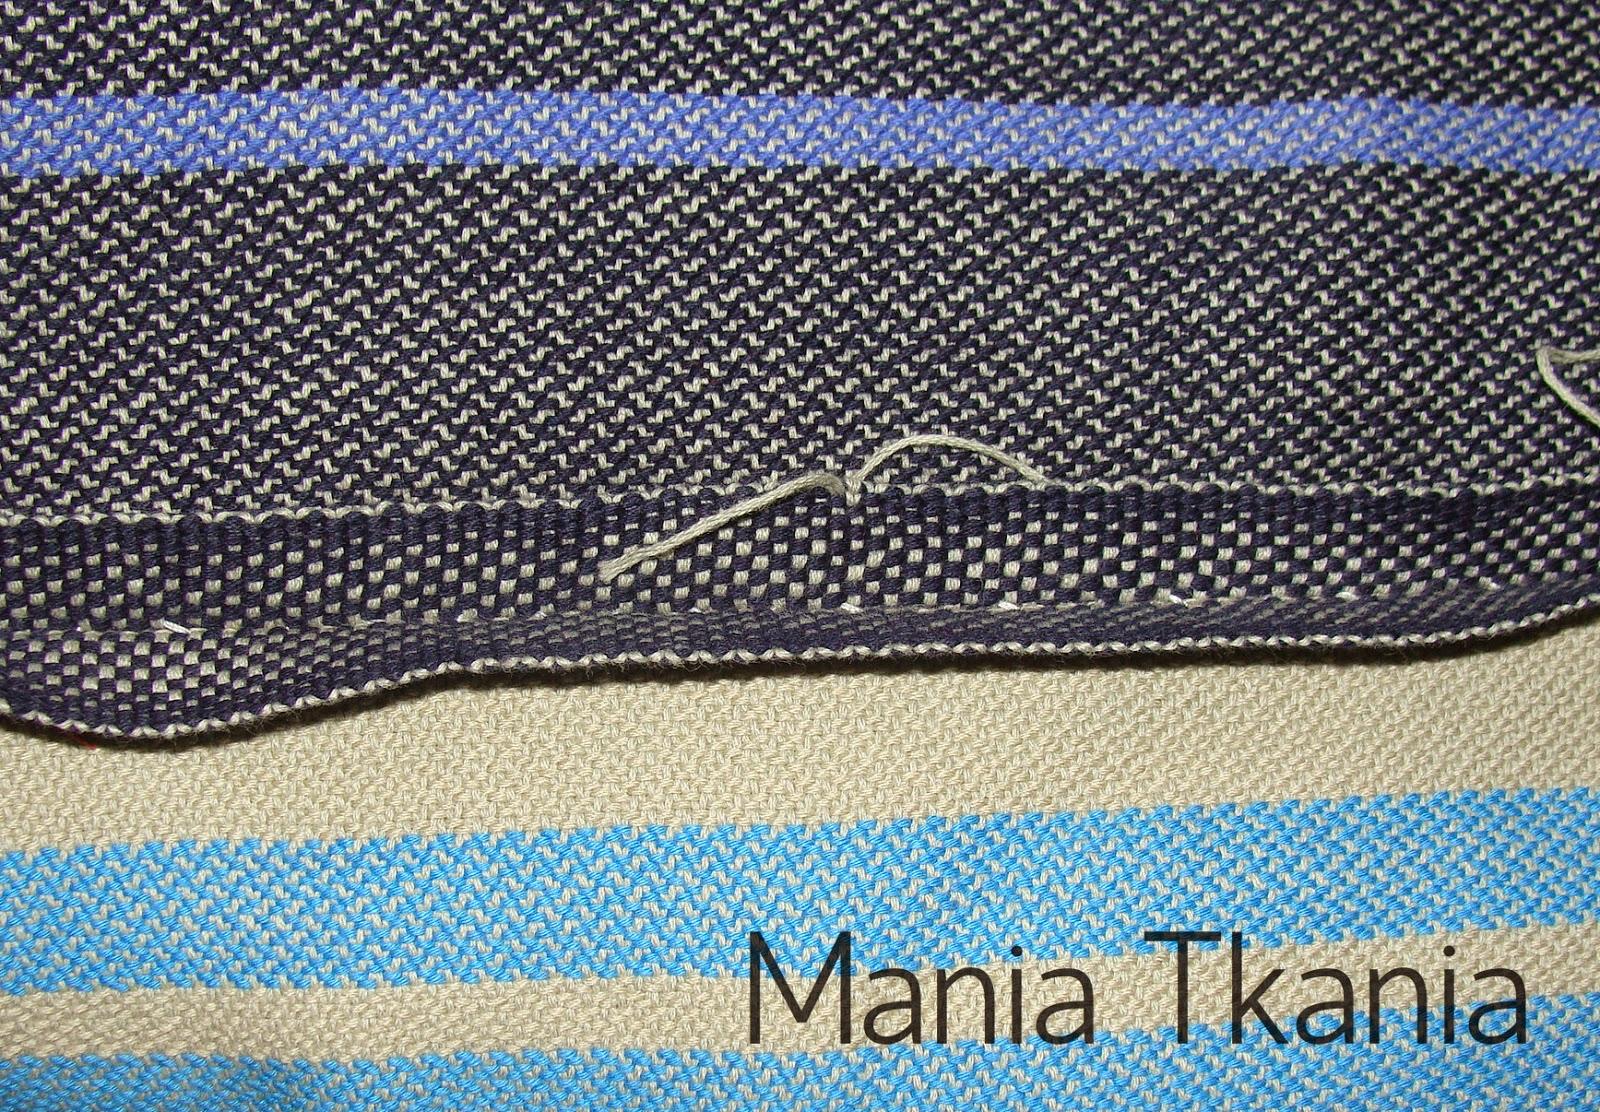 splot panama / basket weave